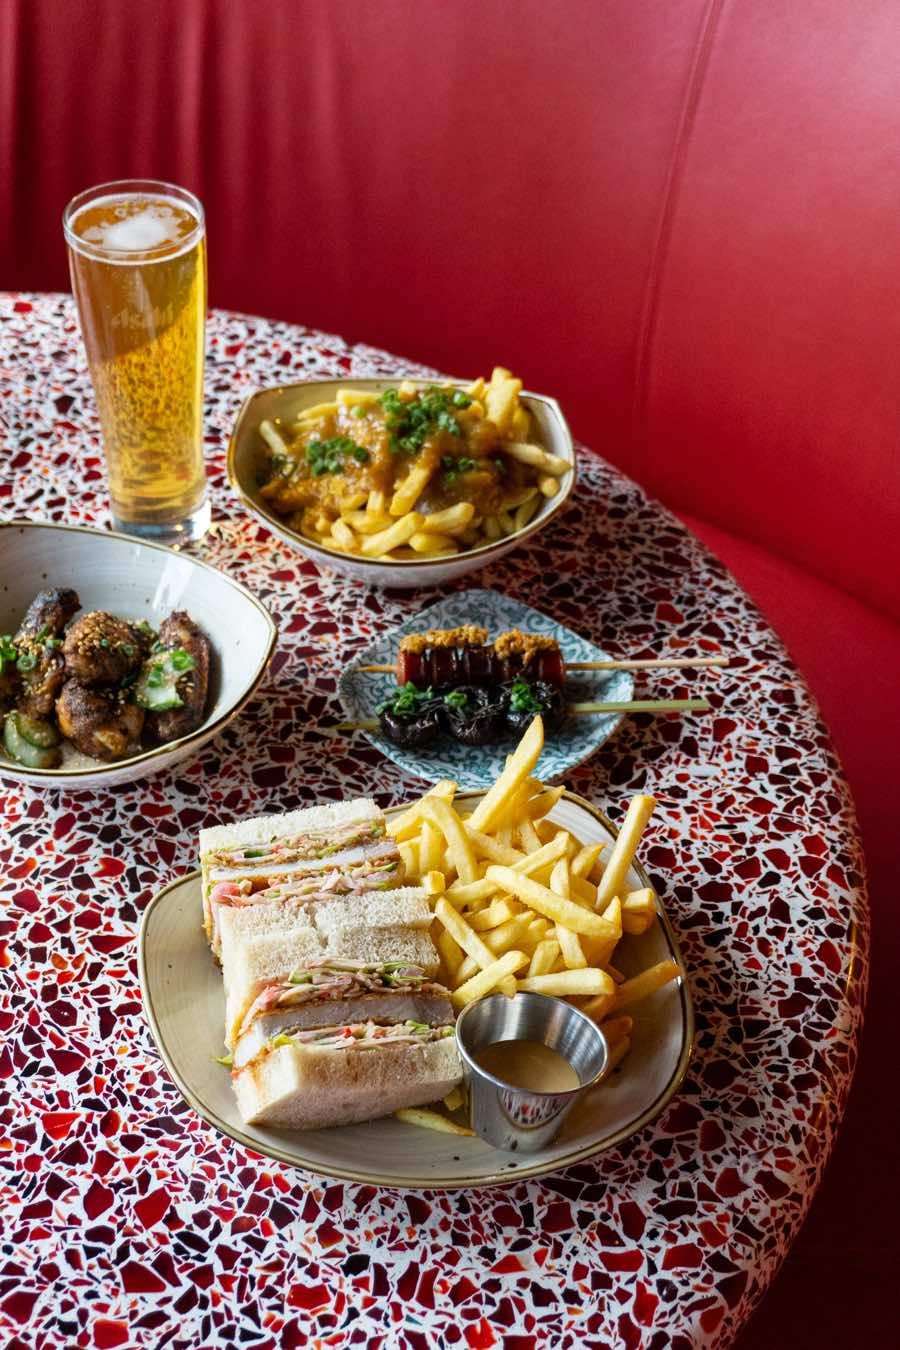 nunu review food menu philadelphia